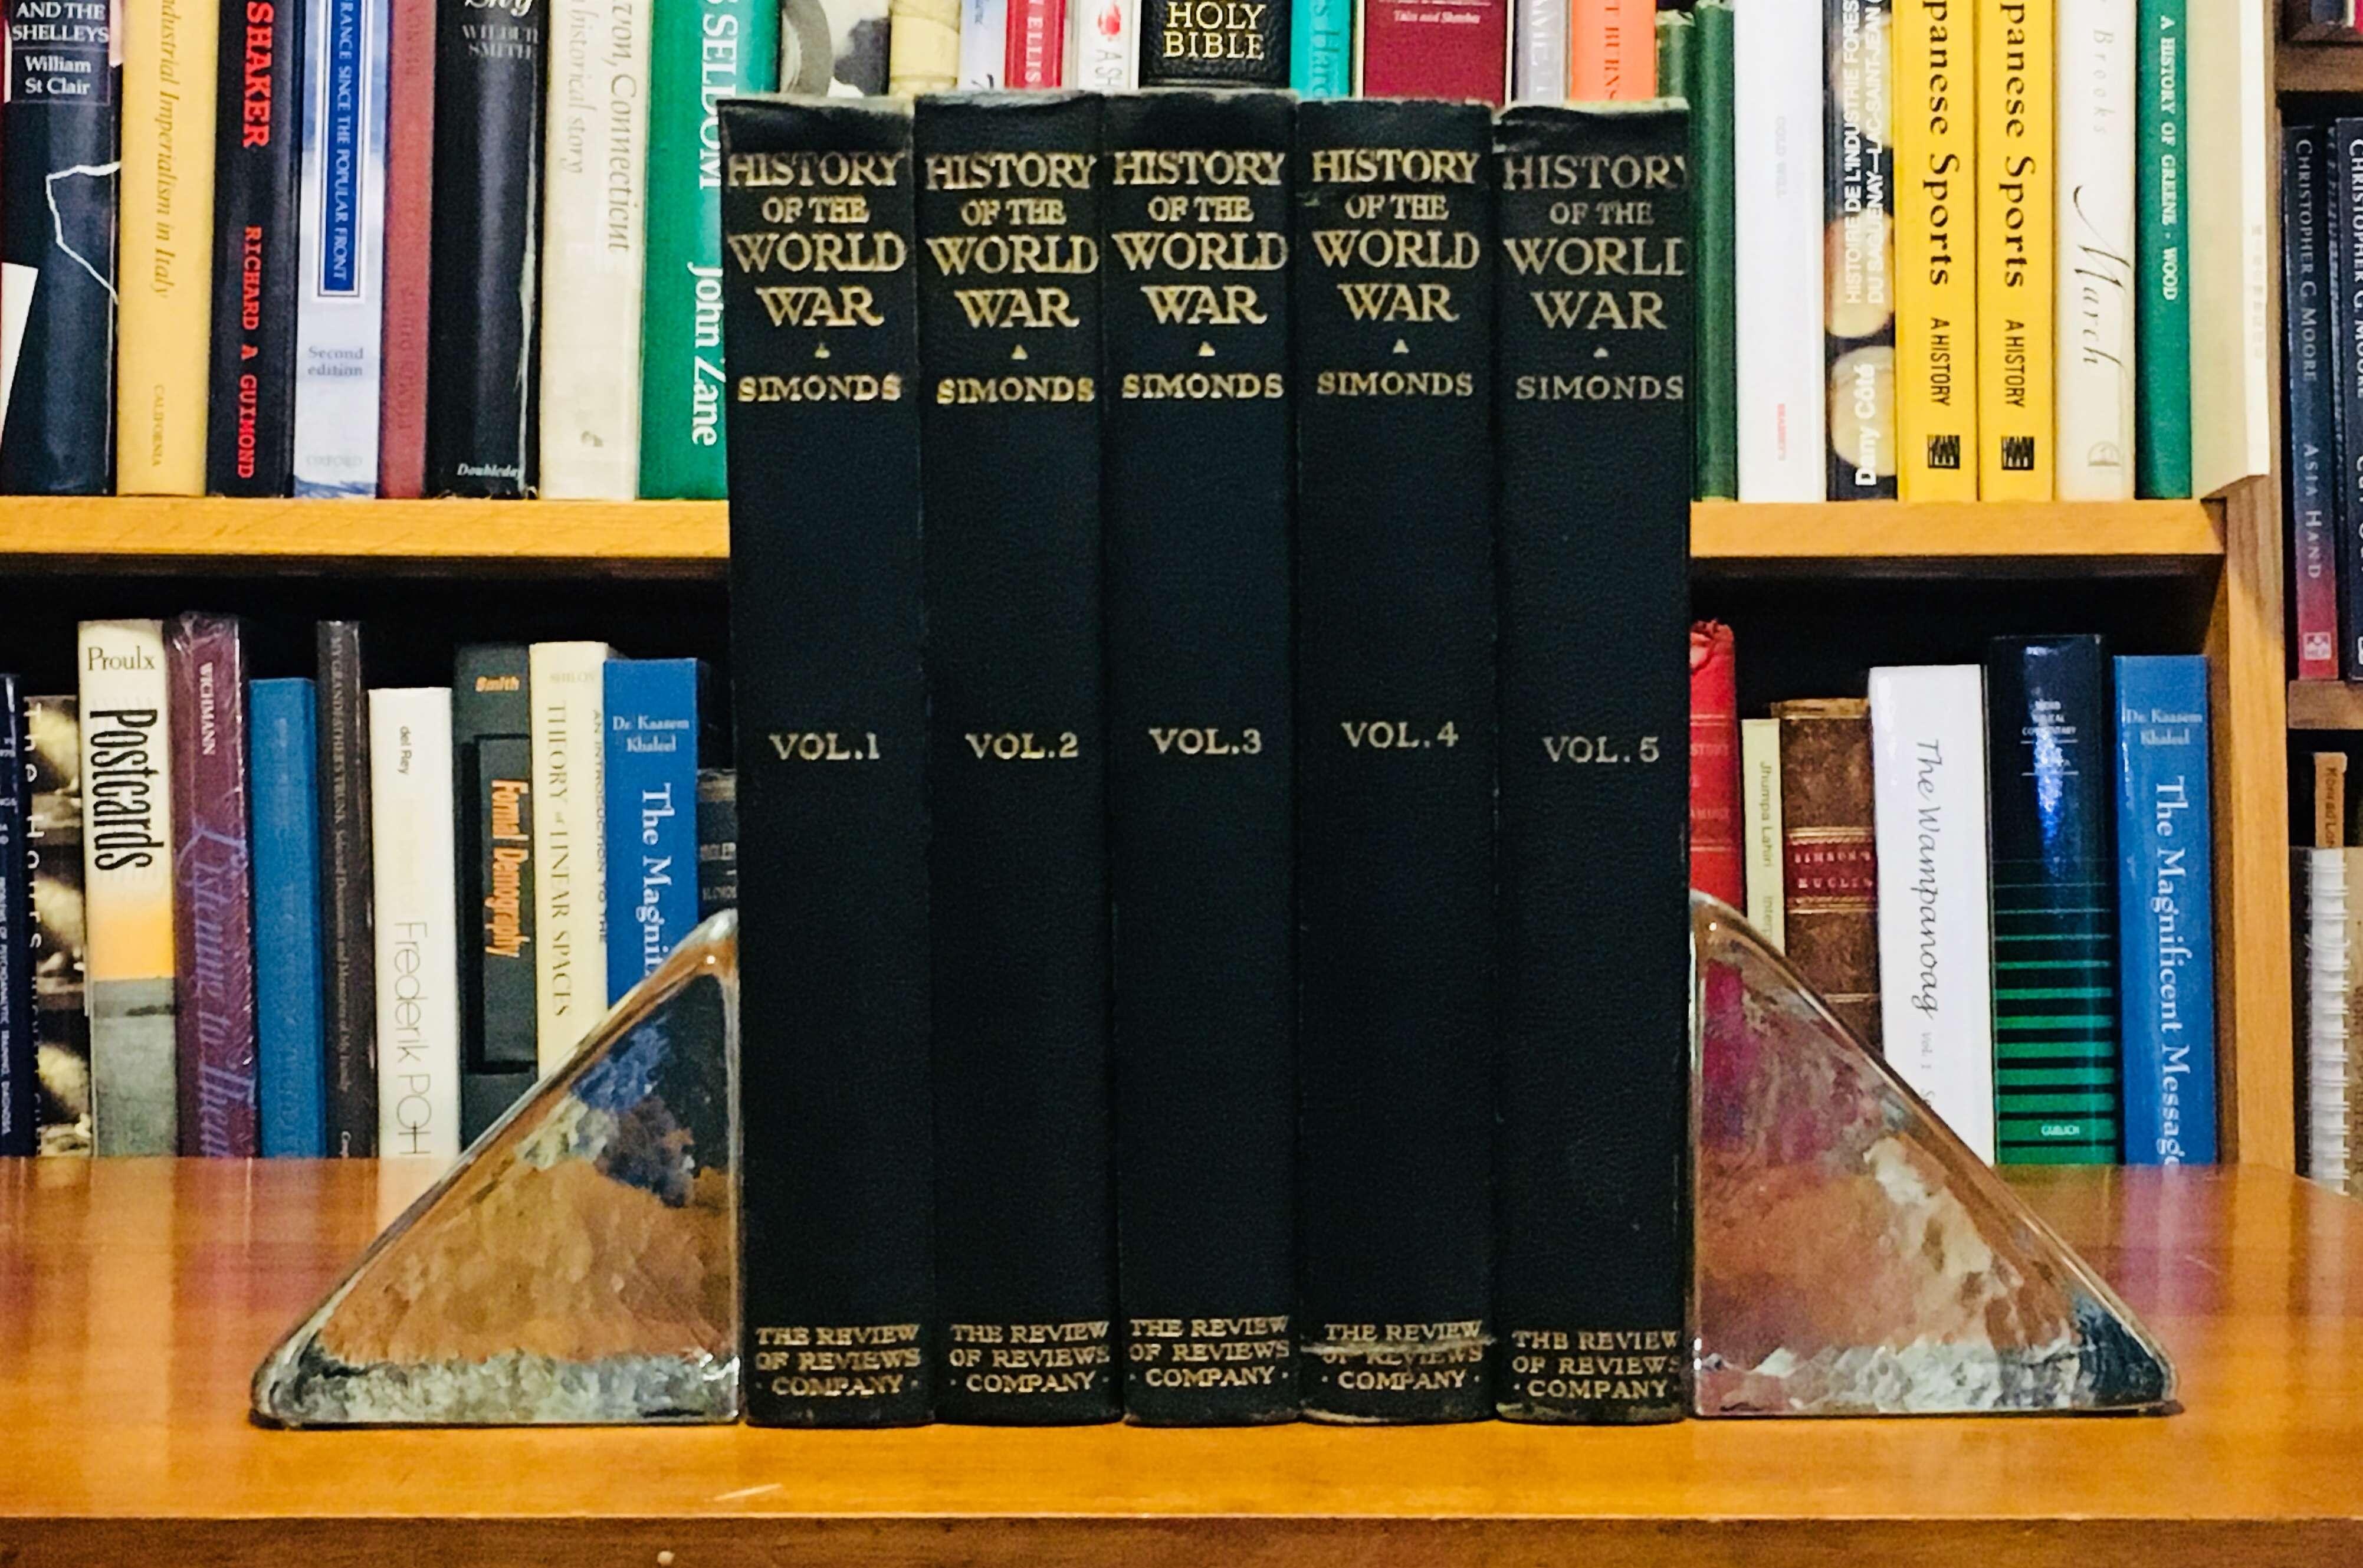 History of the World War (5 volume set), Simonds, Frank H.